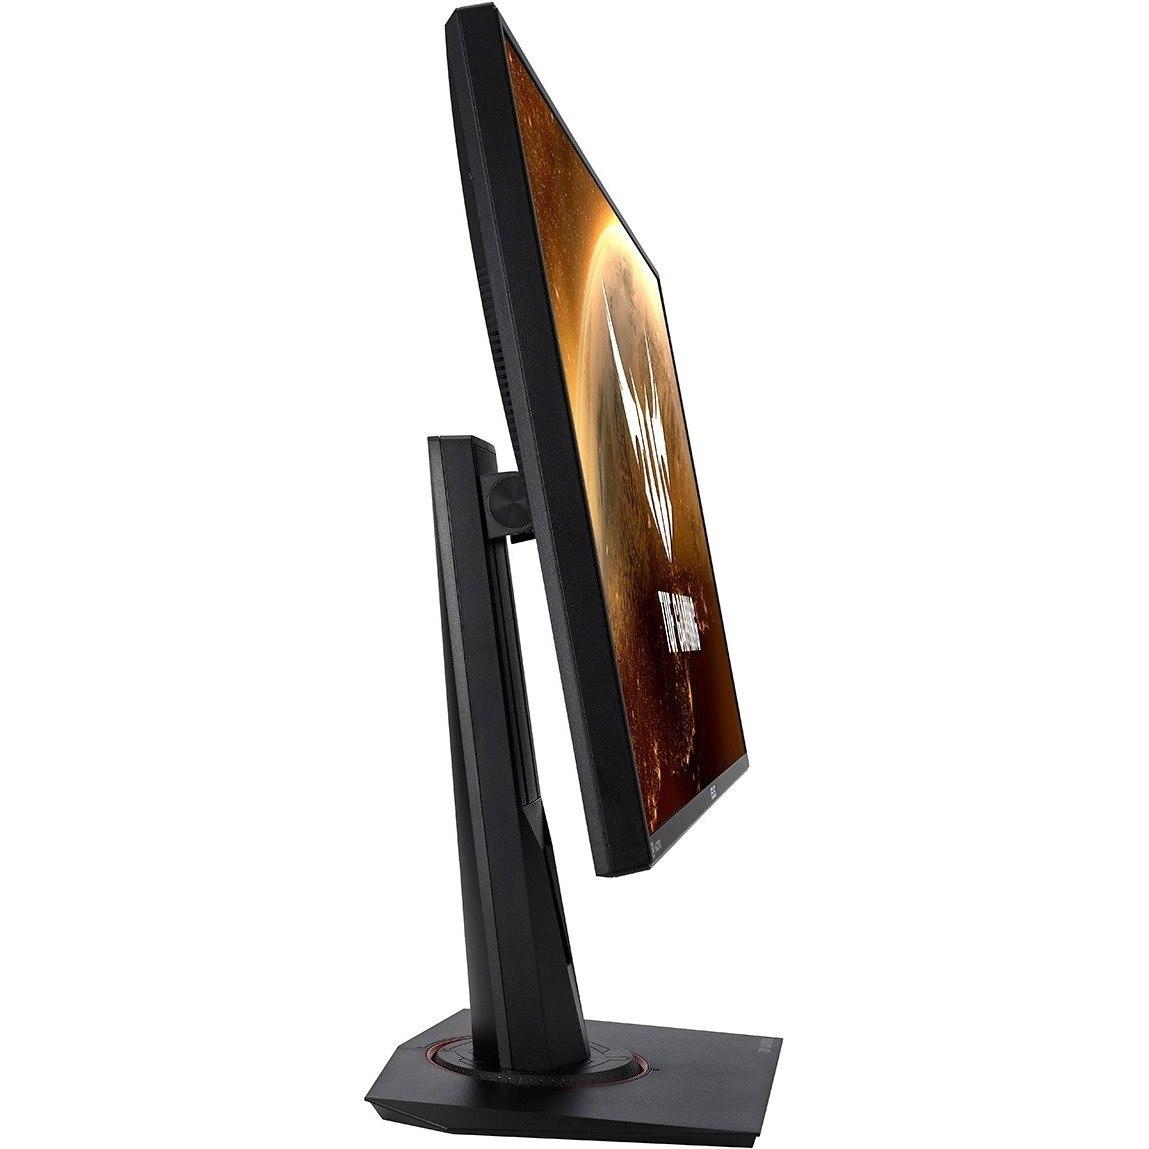 "Asus Gaming VG279QM 68.6 cm (27"") Full HD WLED Gaming LCD Monitor - 16:9 - Black"